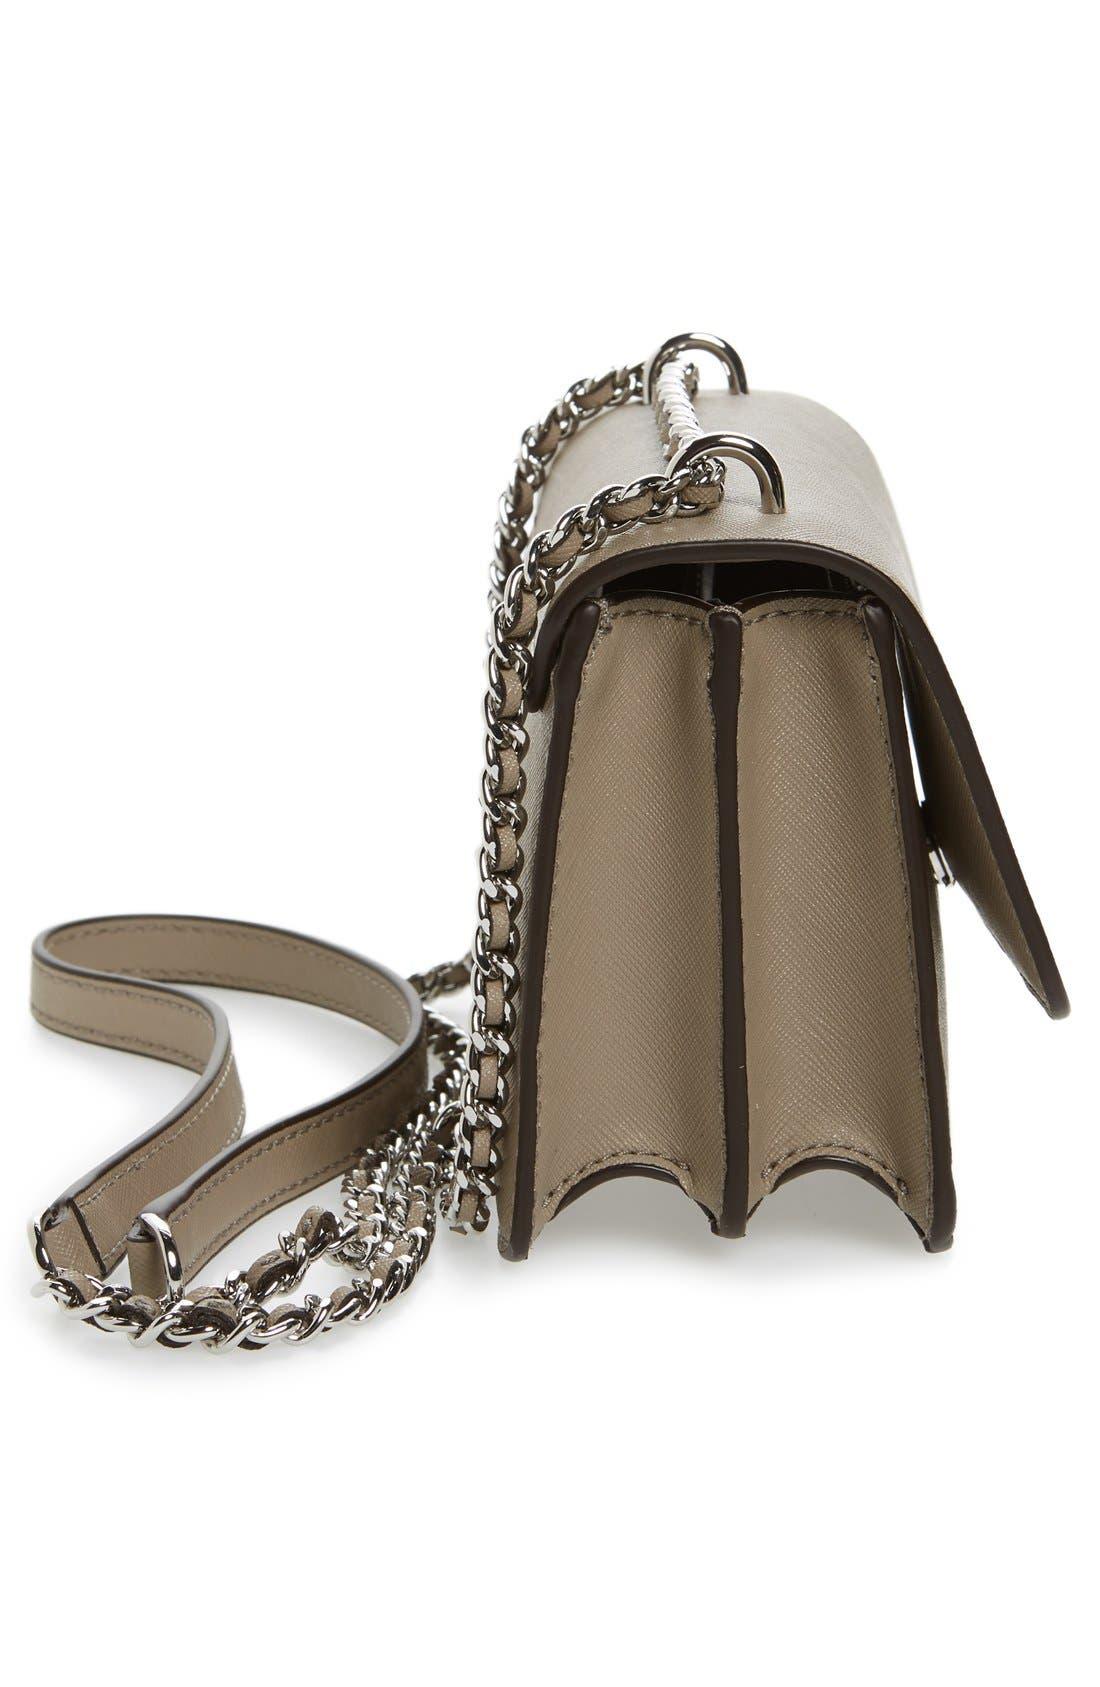 Mini Robinson Convertible Leather Shoulder Bag,                             Alternate thumbnail 6, color,                             036